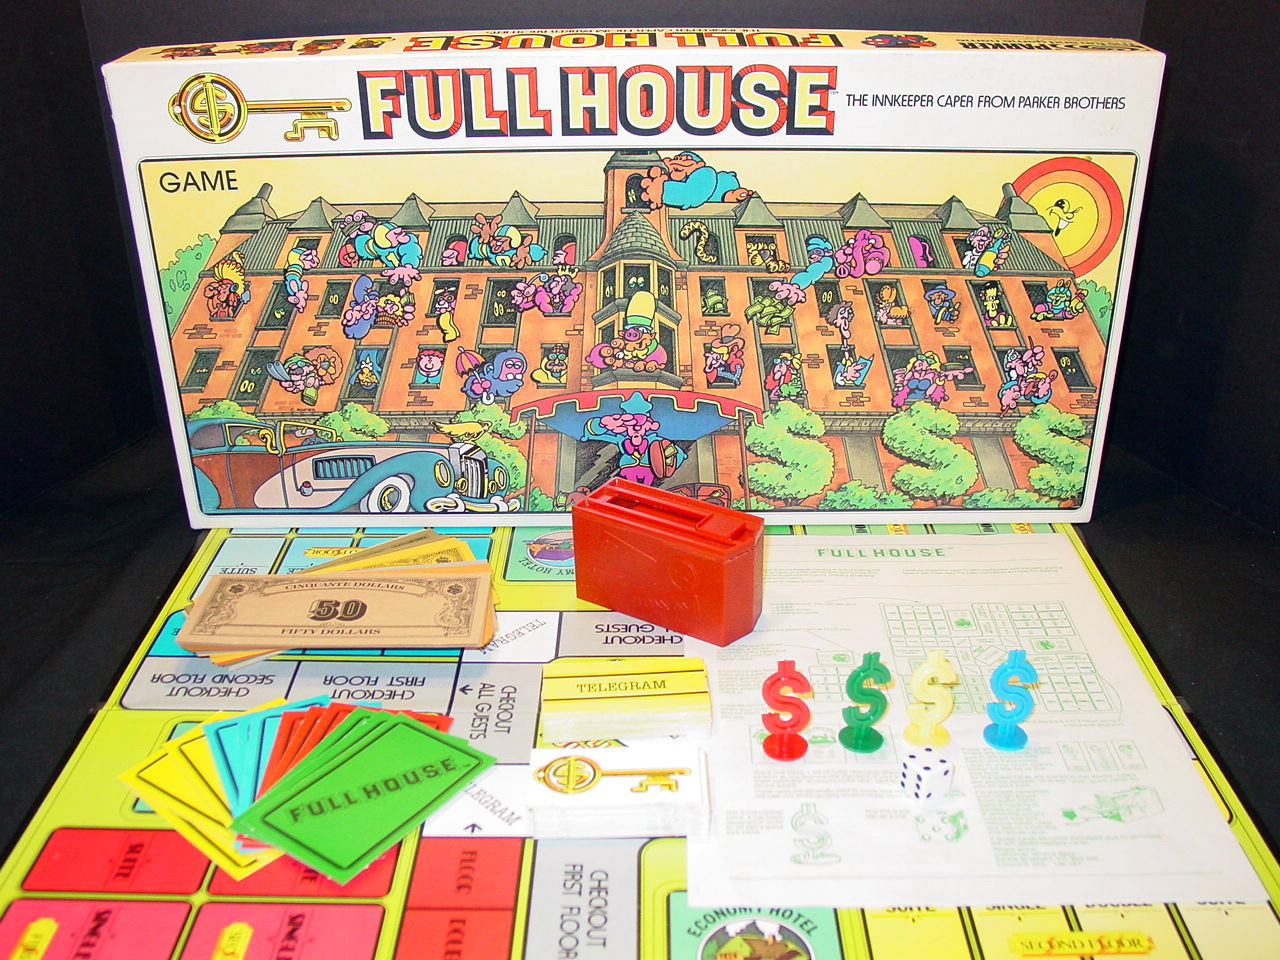 Full House Games For Free